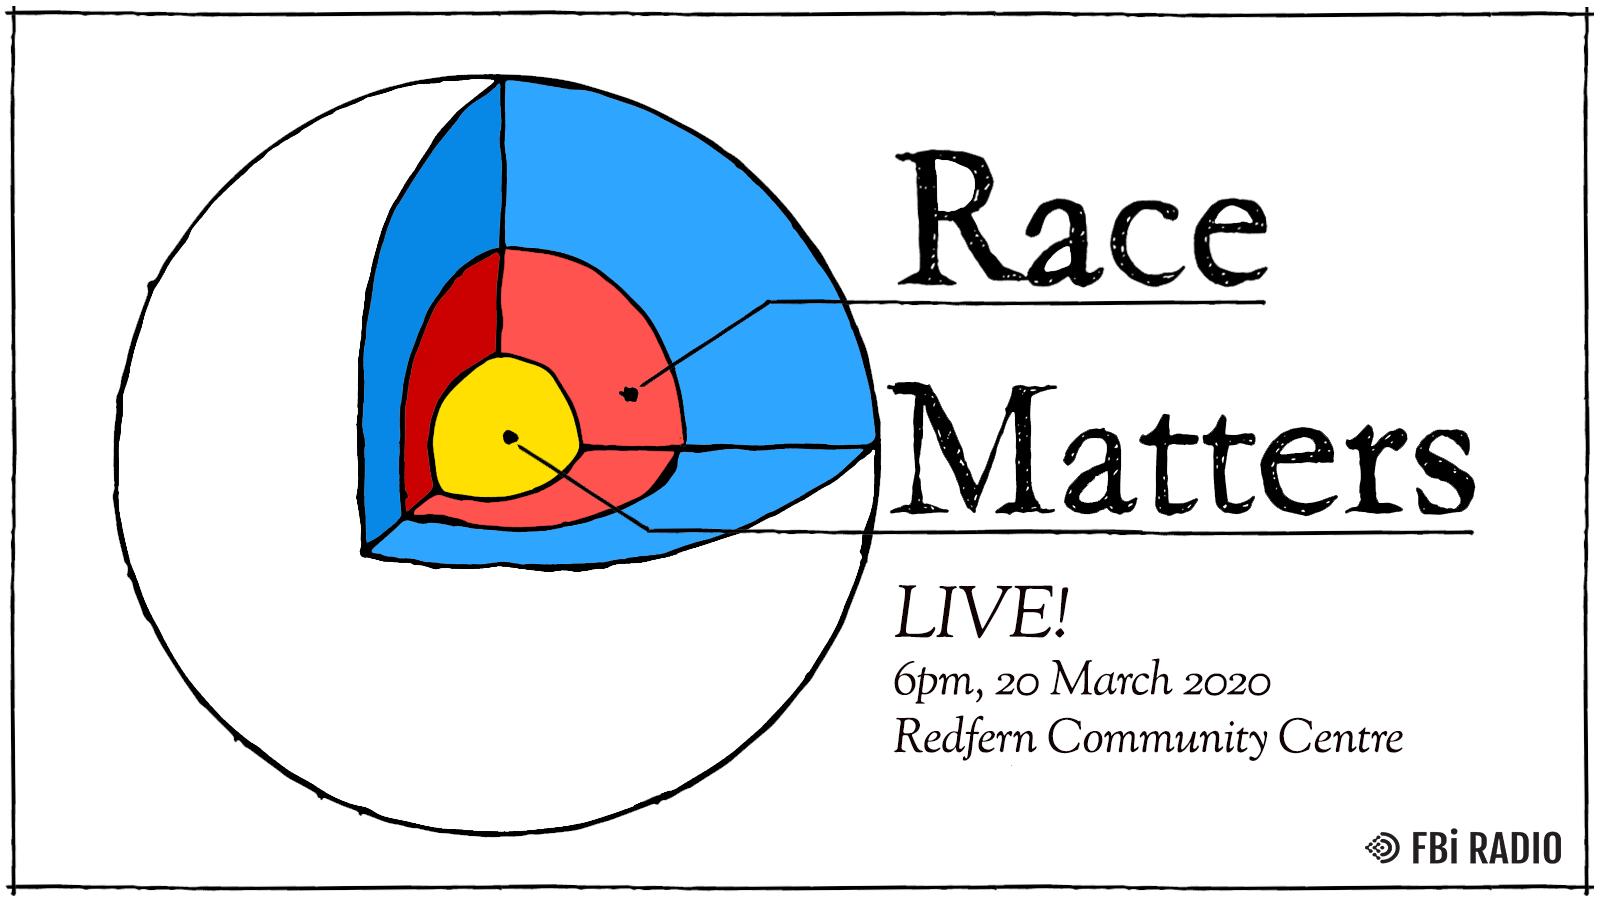 Race Matters Live